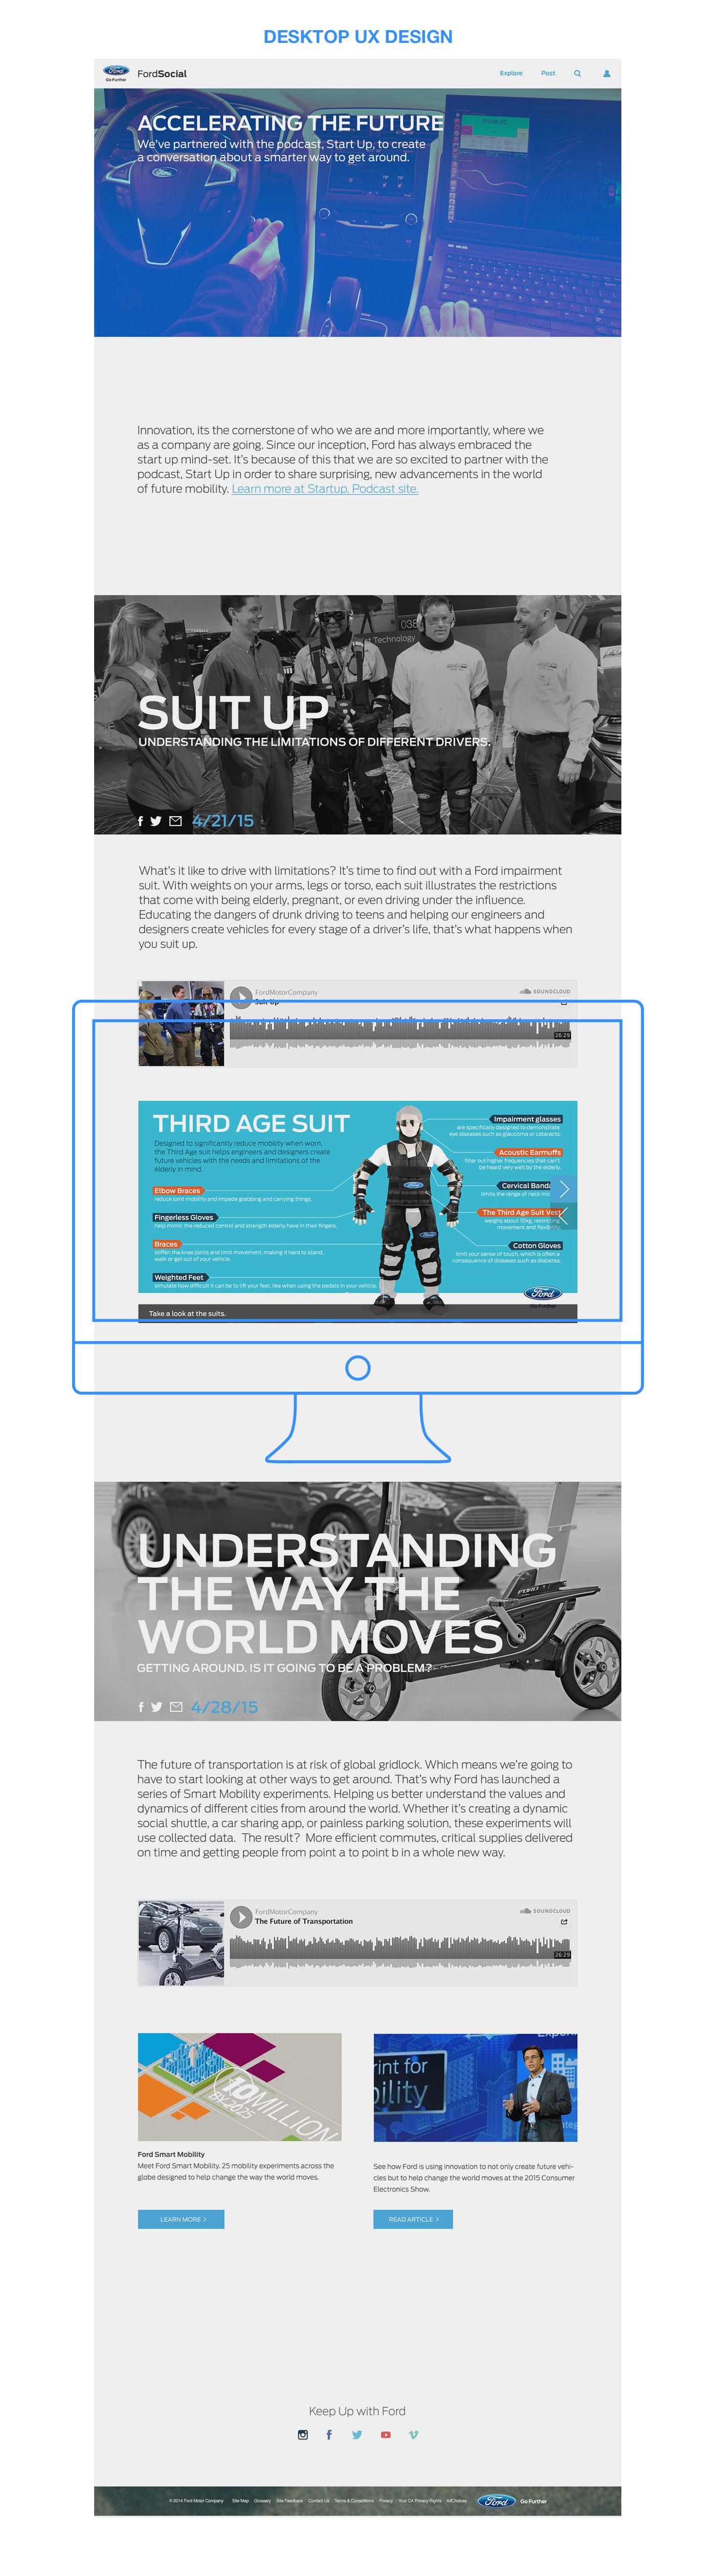 desktop-ux.jpg